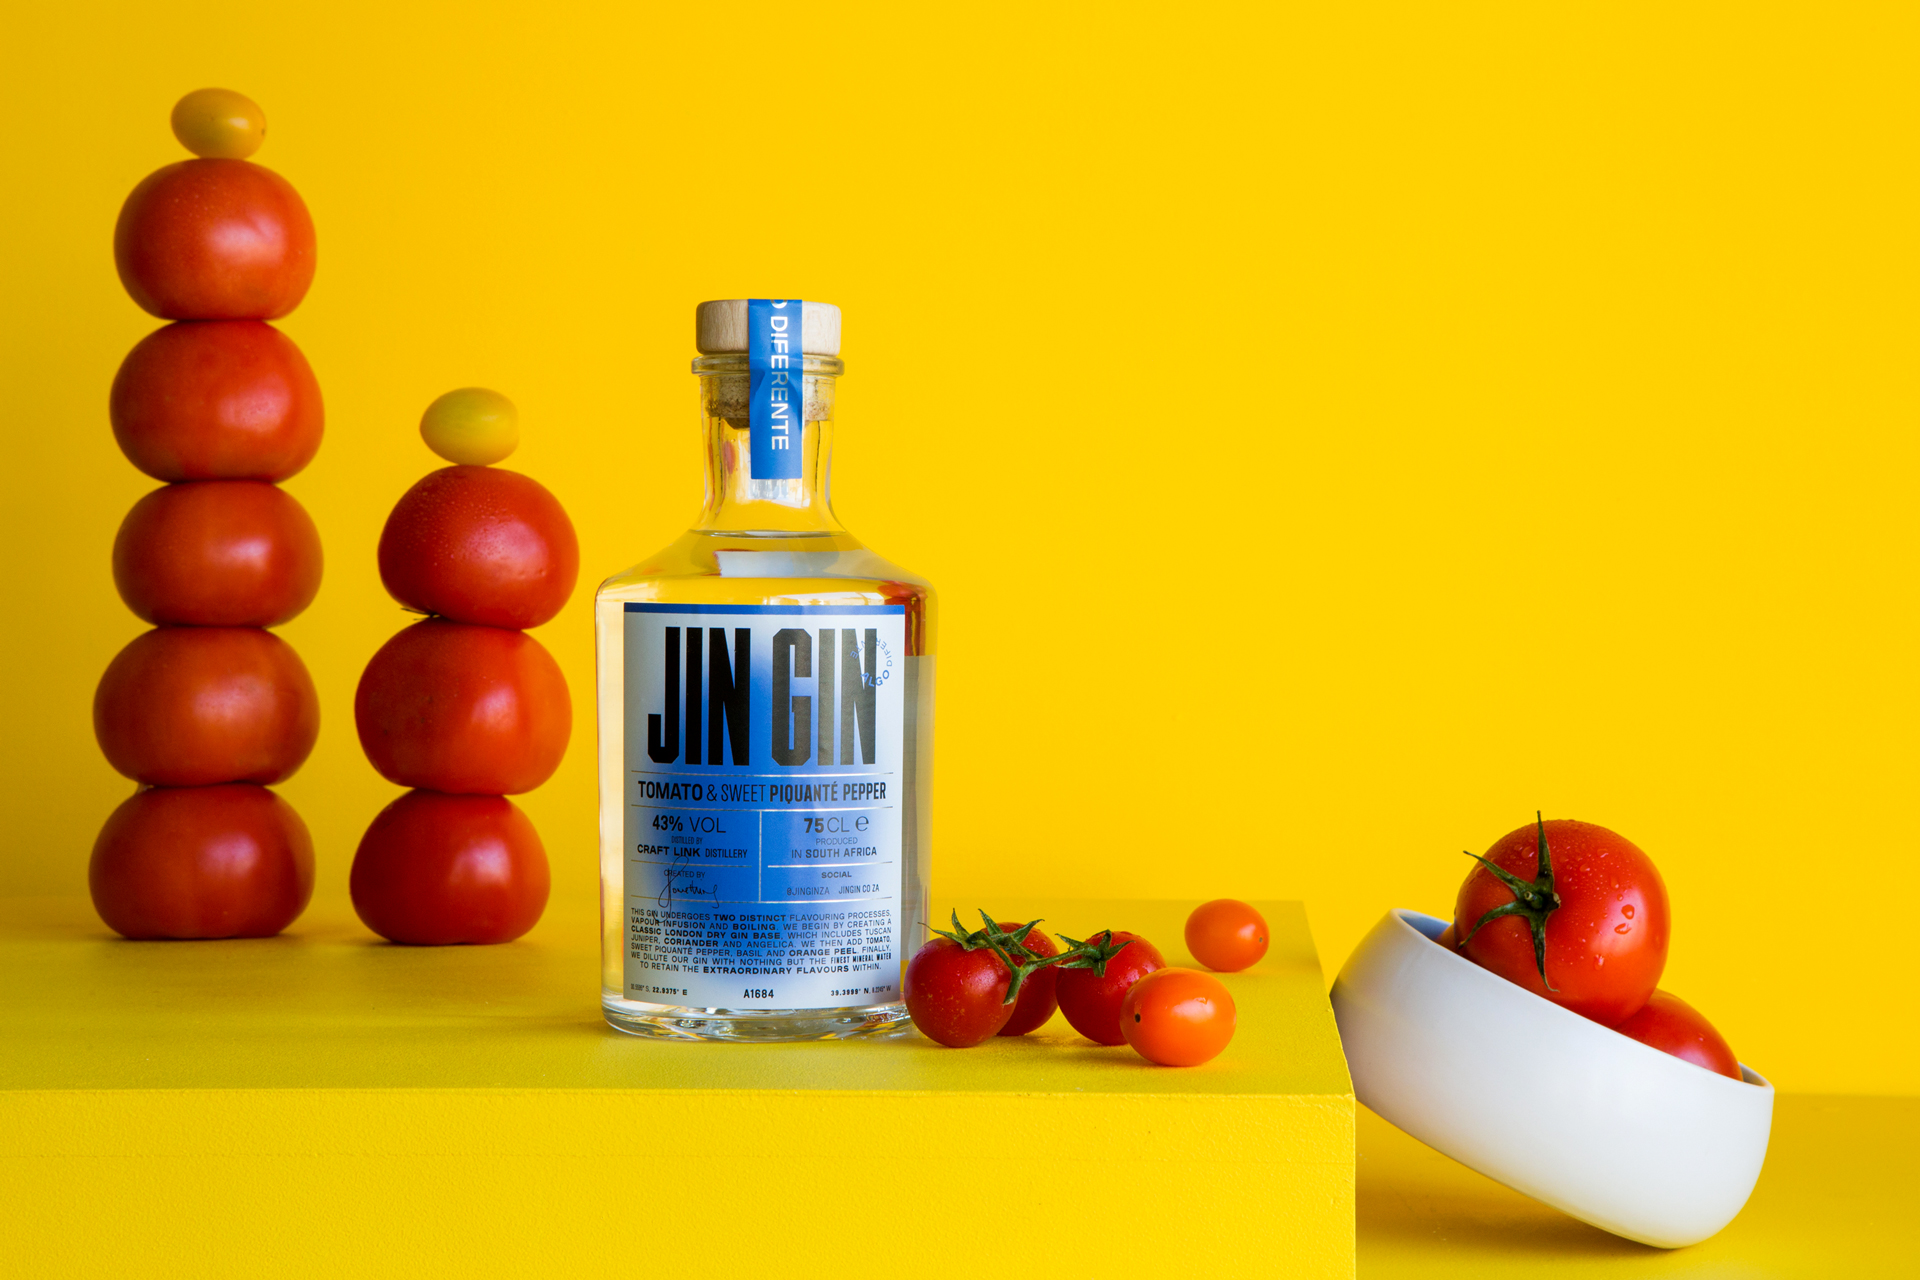 Jin-Gin-Tomato-&-Sweet-Piquante-Pepper.jpg